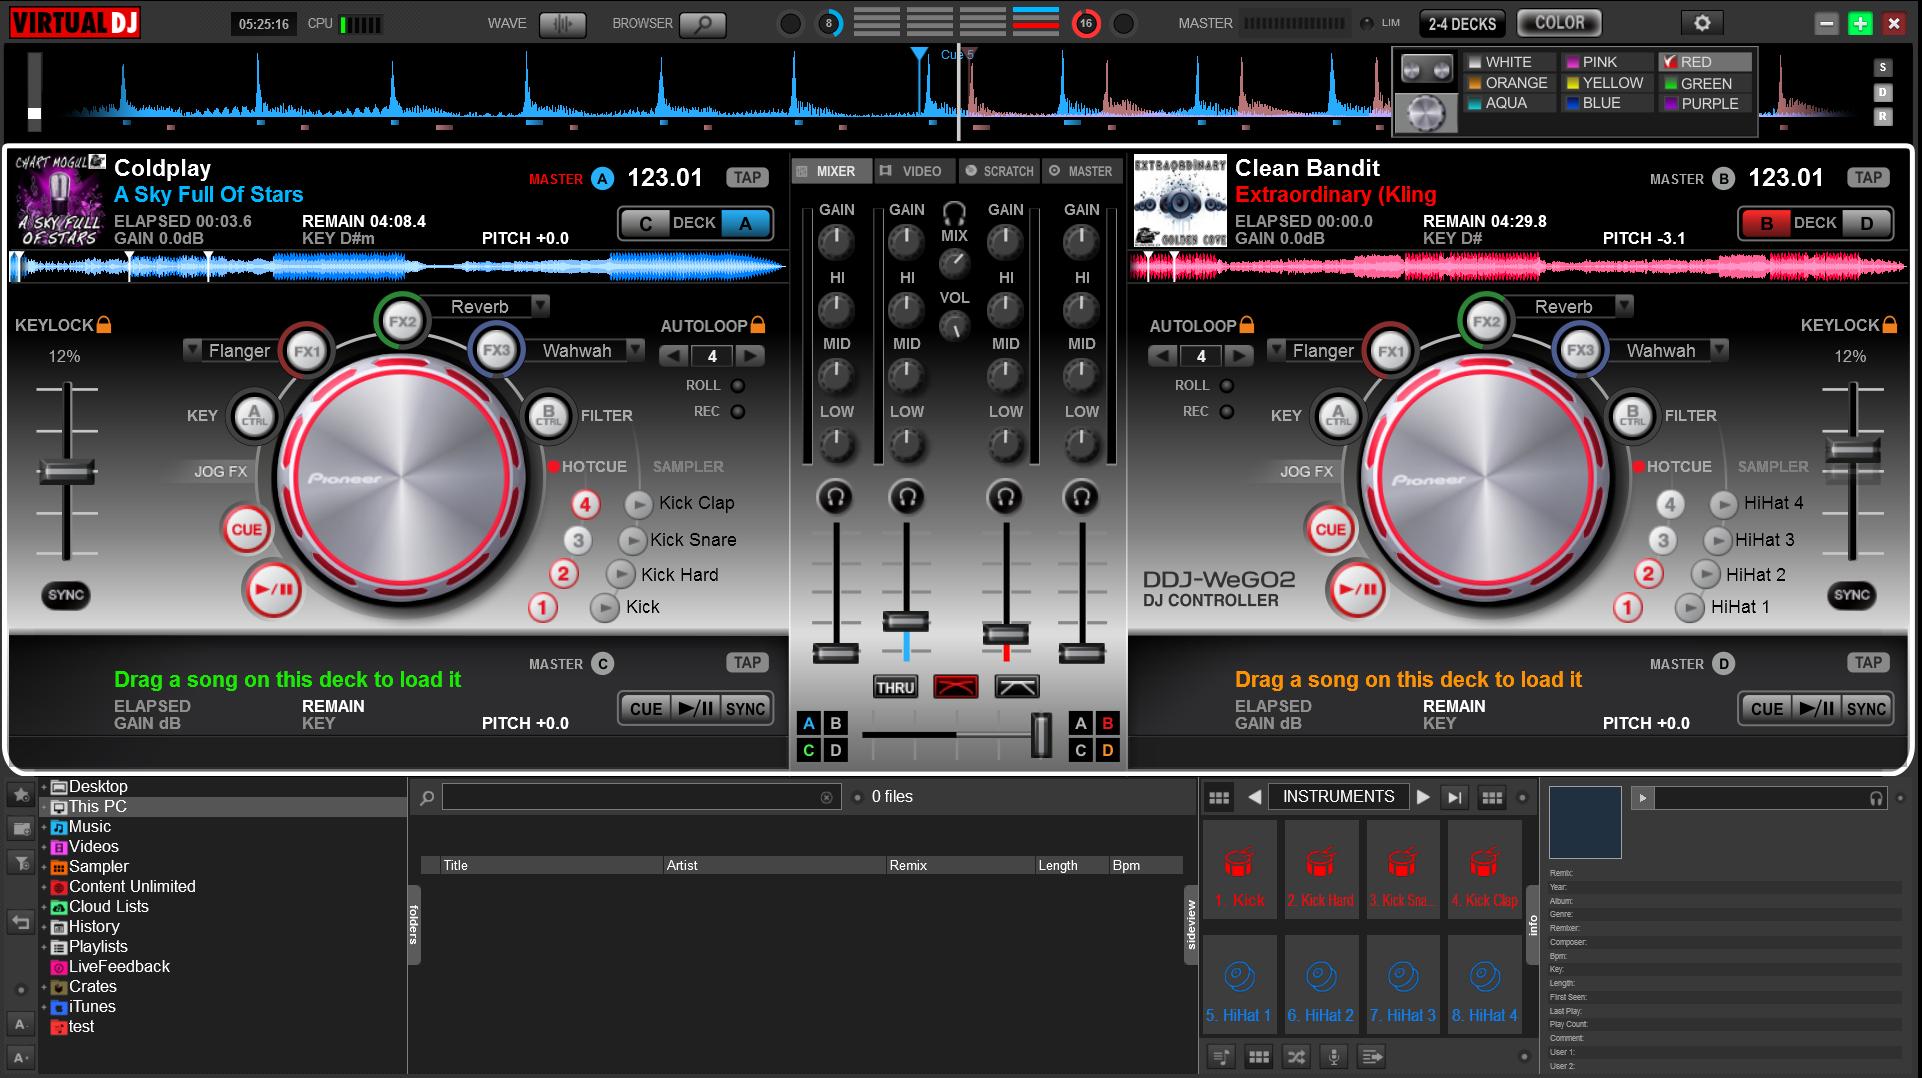 Virtual DJ Plugins Mega-Pack Mirror 2 (Usenet)